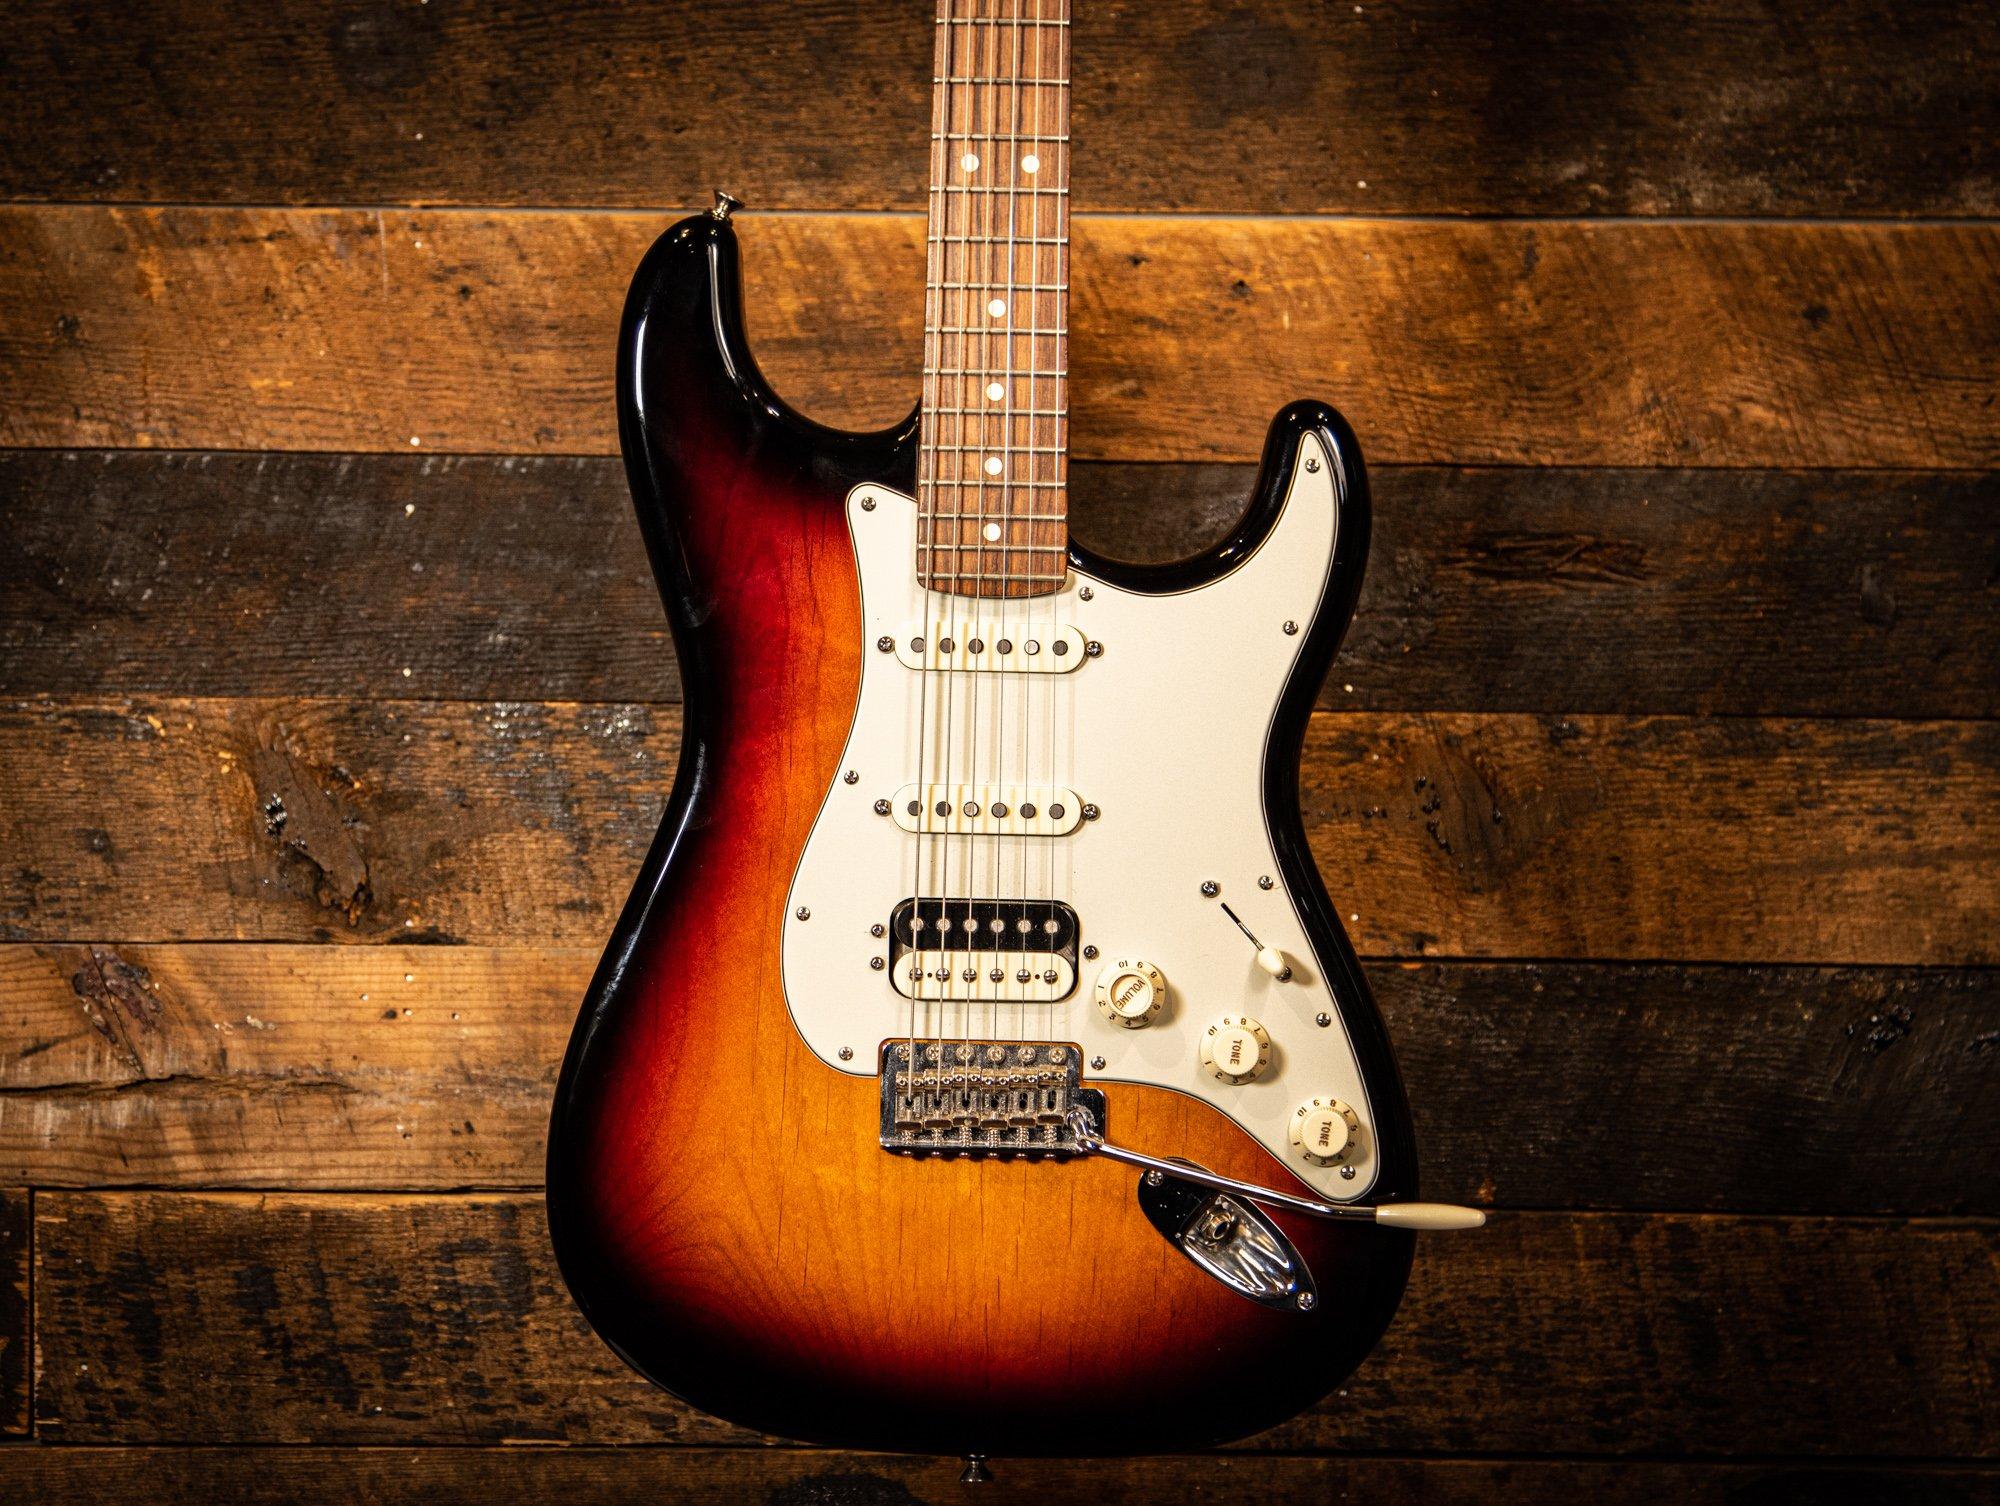 Pre Owned Fender American HSS Strat w/S1 Switch 3 Tone Sunburst